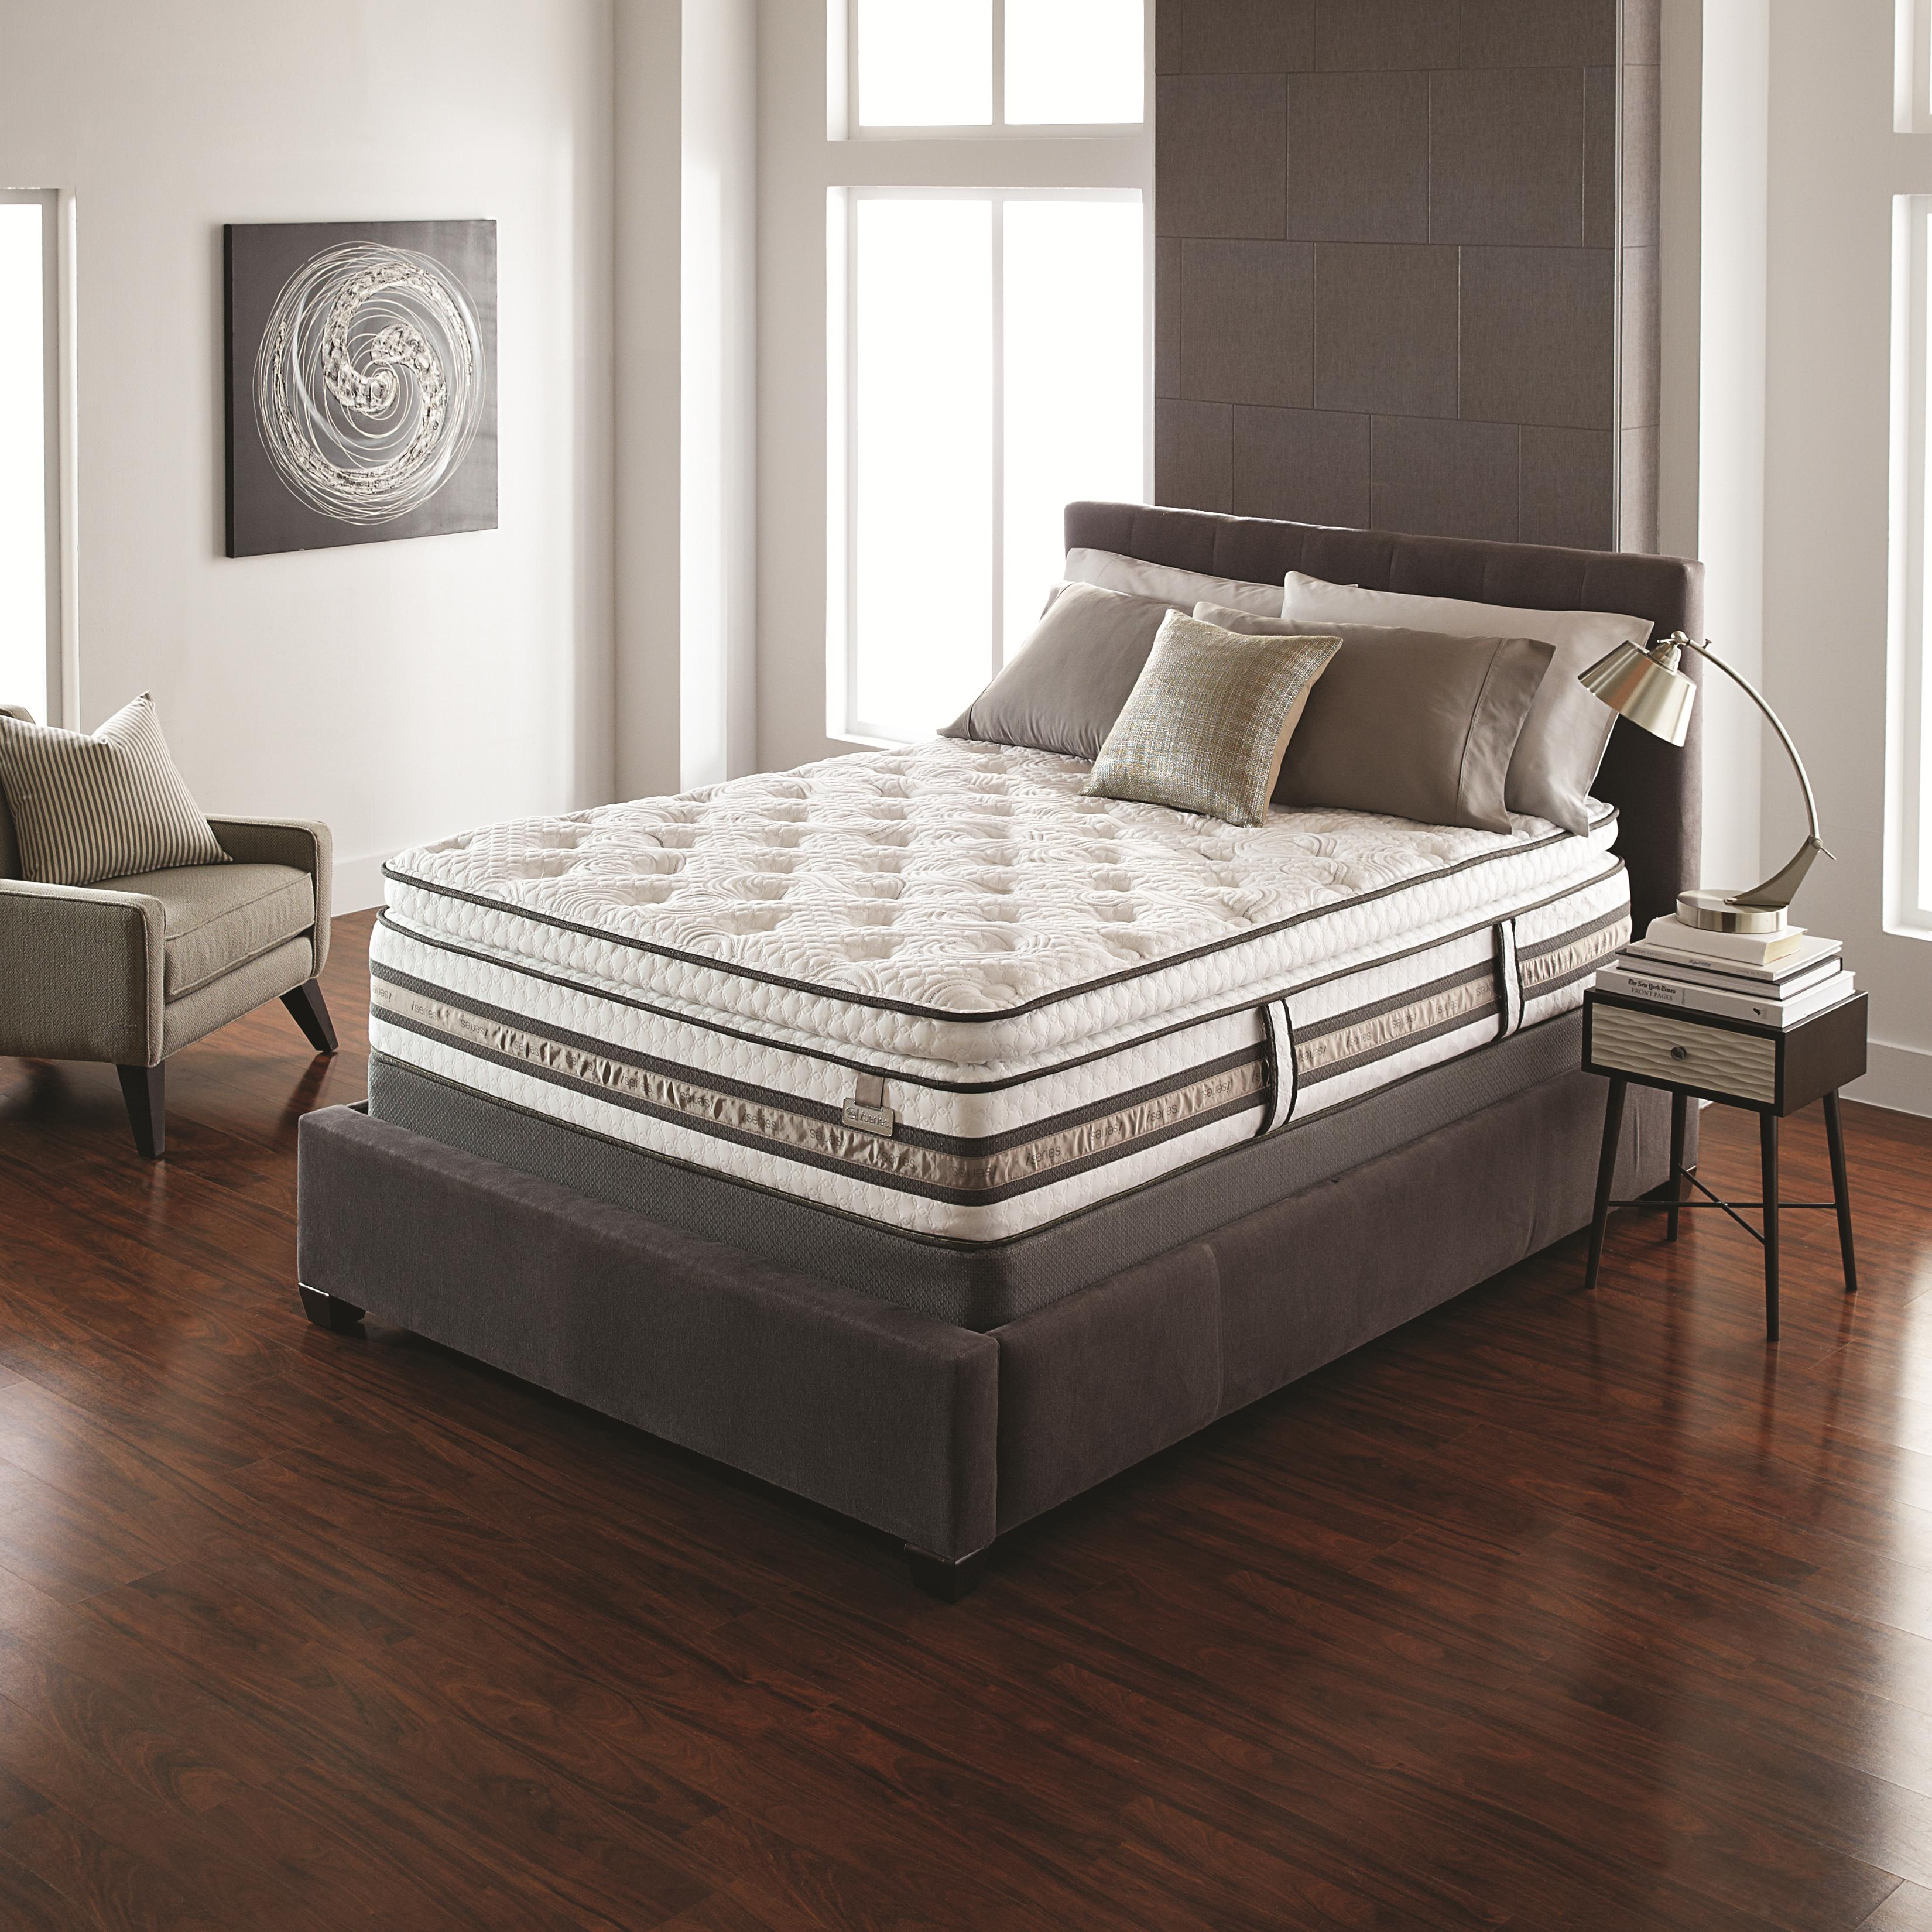 Serta iSeries Merit Full Super Pillow Top Mattress - Item Number: 400073F